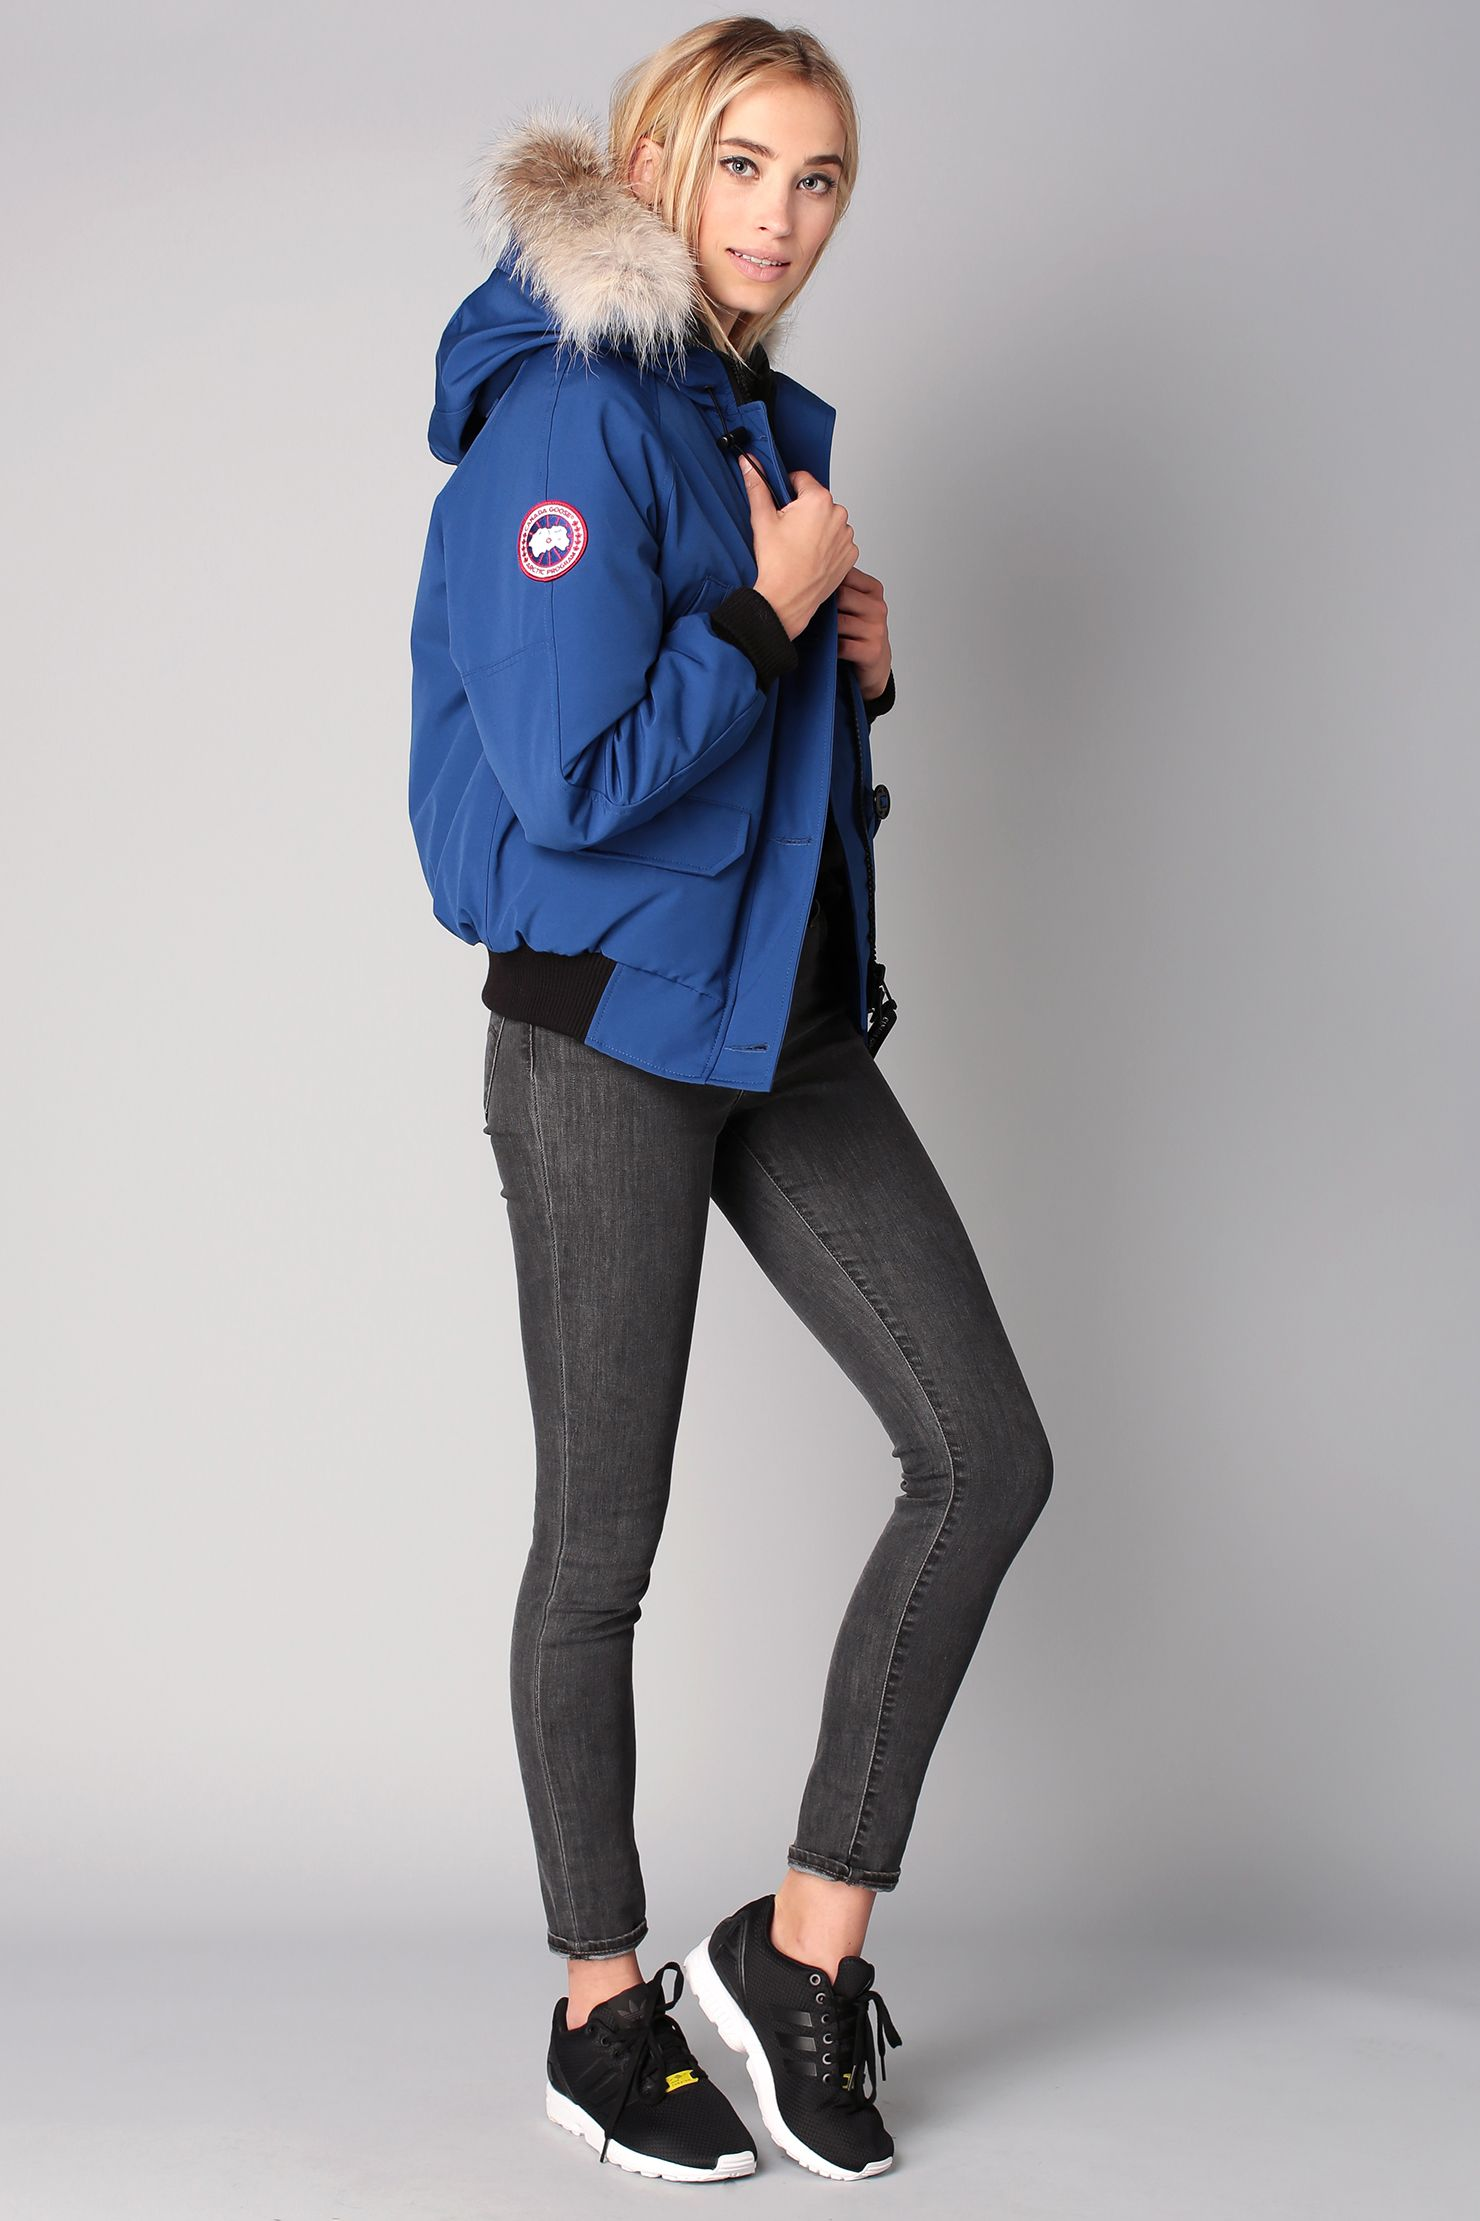 Blouson aviateur bleu matellassé Chilliwak - Canada Goose Parka Femme Hiver,  Veste Ski Femme, 795f78721b44